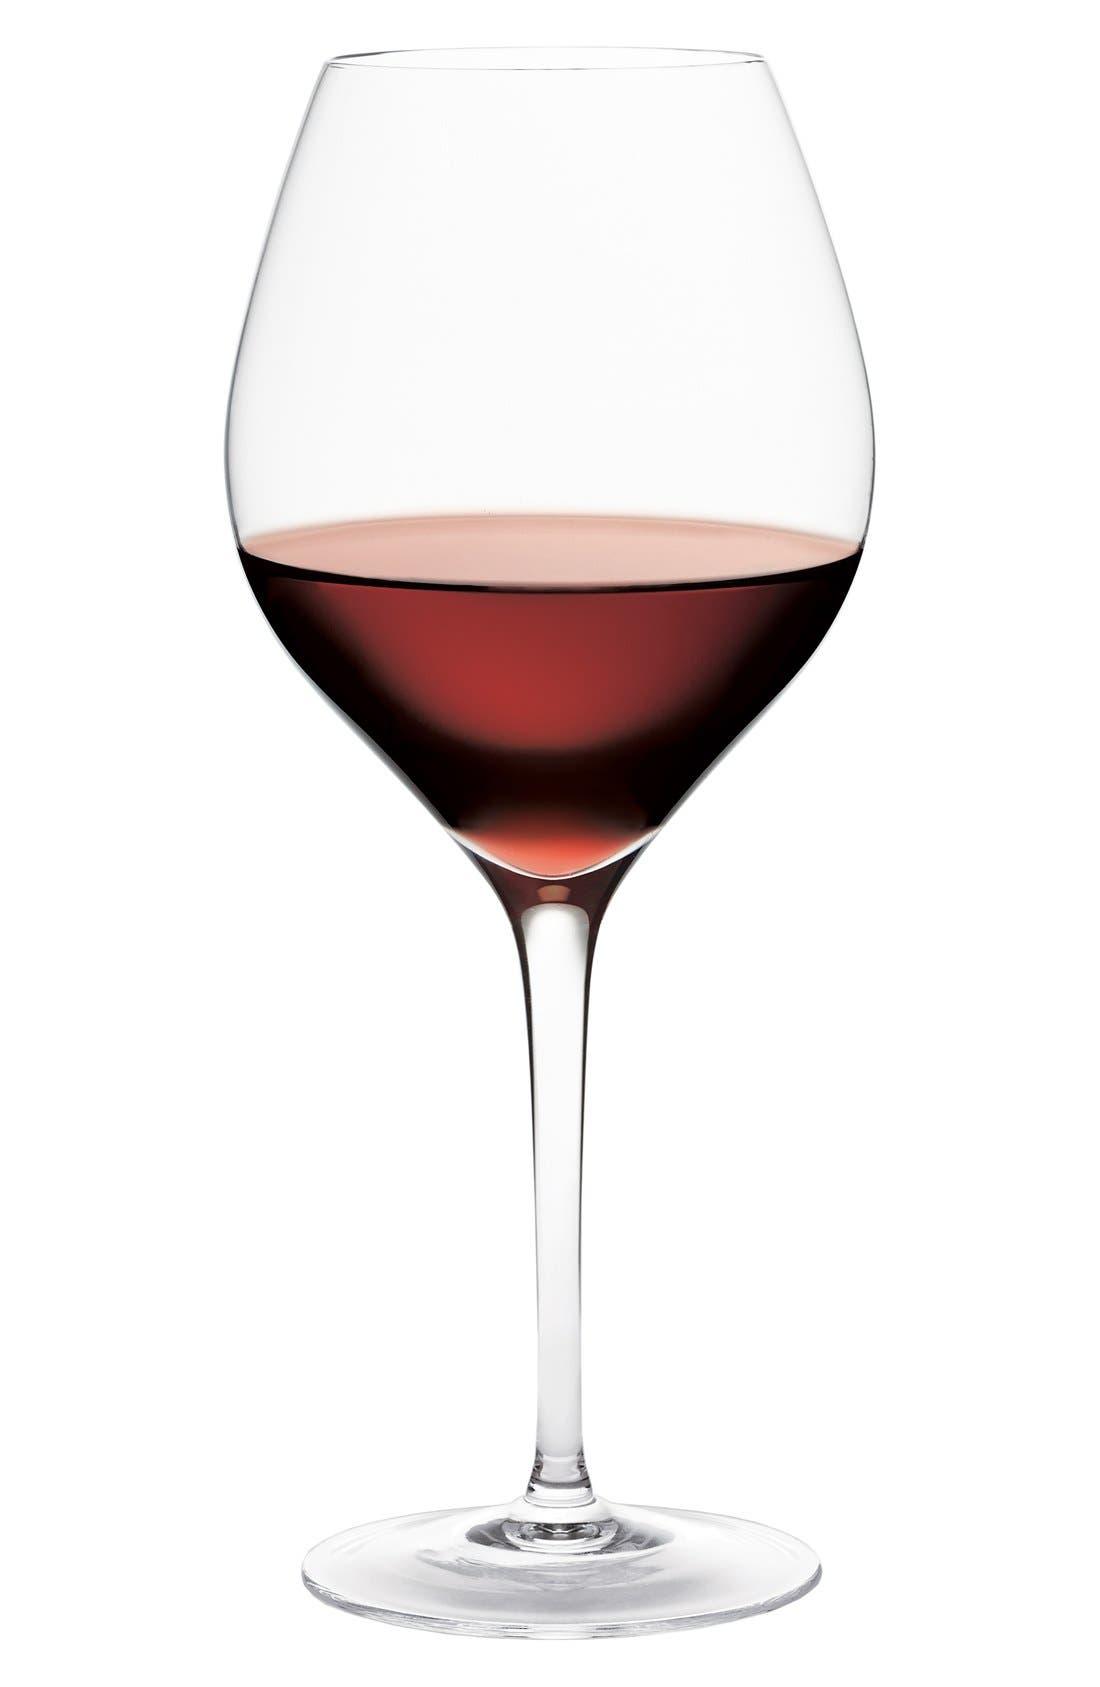 Ravenna Set of 4 Red Wine Glasses,                             Main thumbnail 1, color,                             No Color